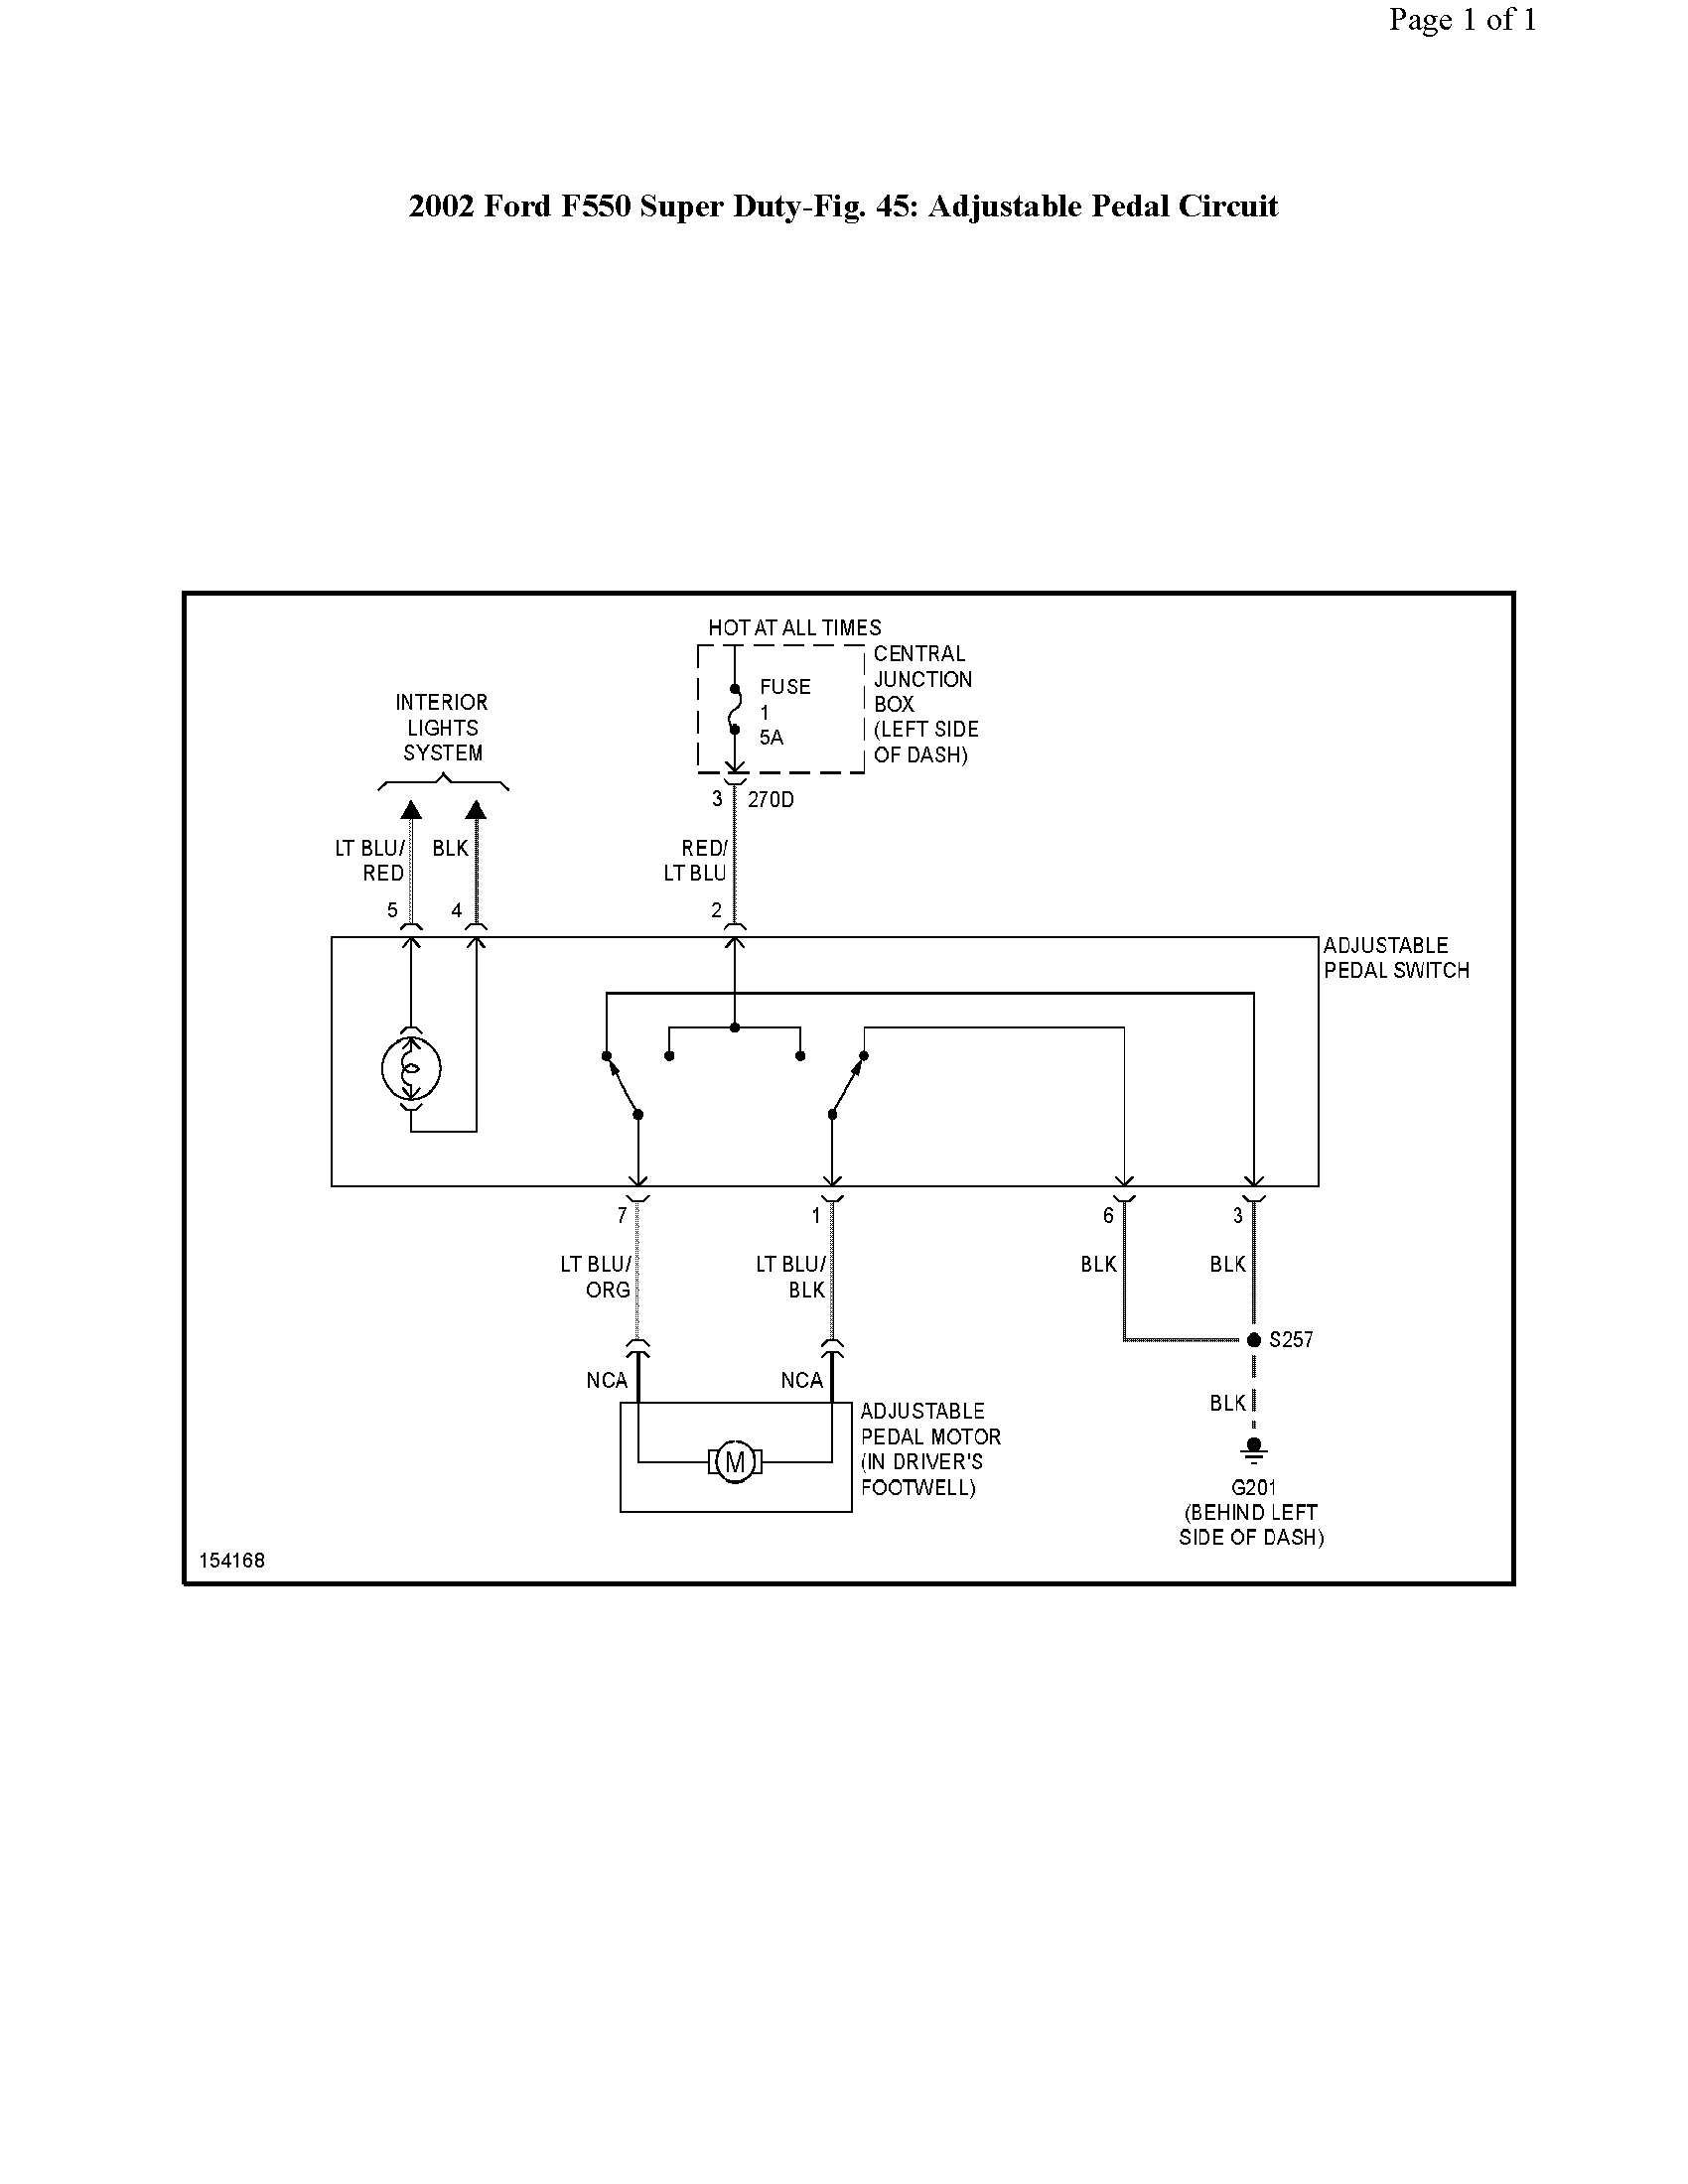 Psd 05 F250 Fuse Box Wiring Library F350 Diagram 14a067 2000 Diesel Forum Html 1997 2008